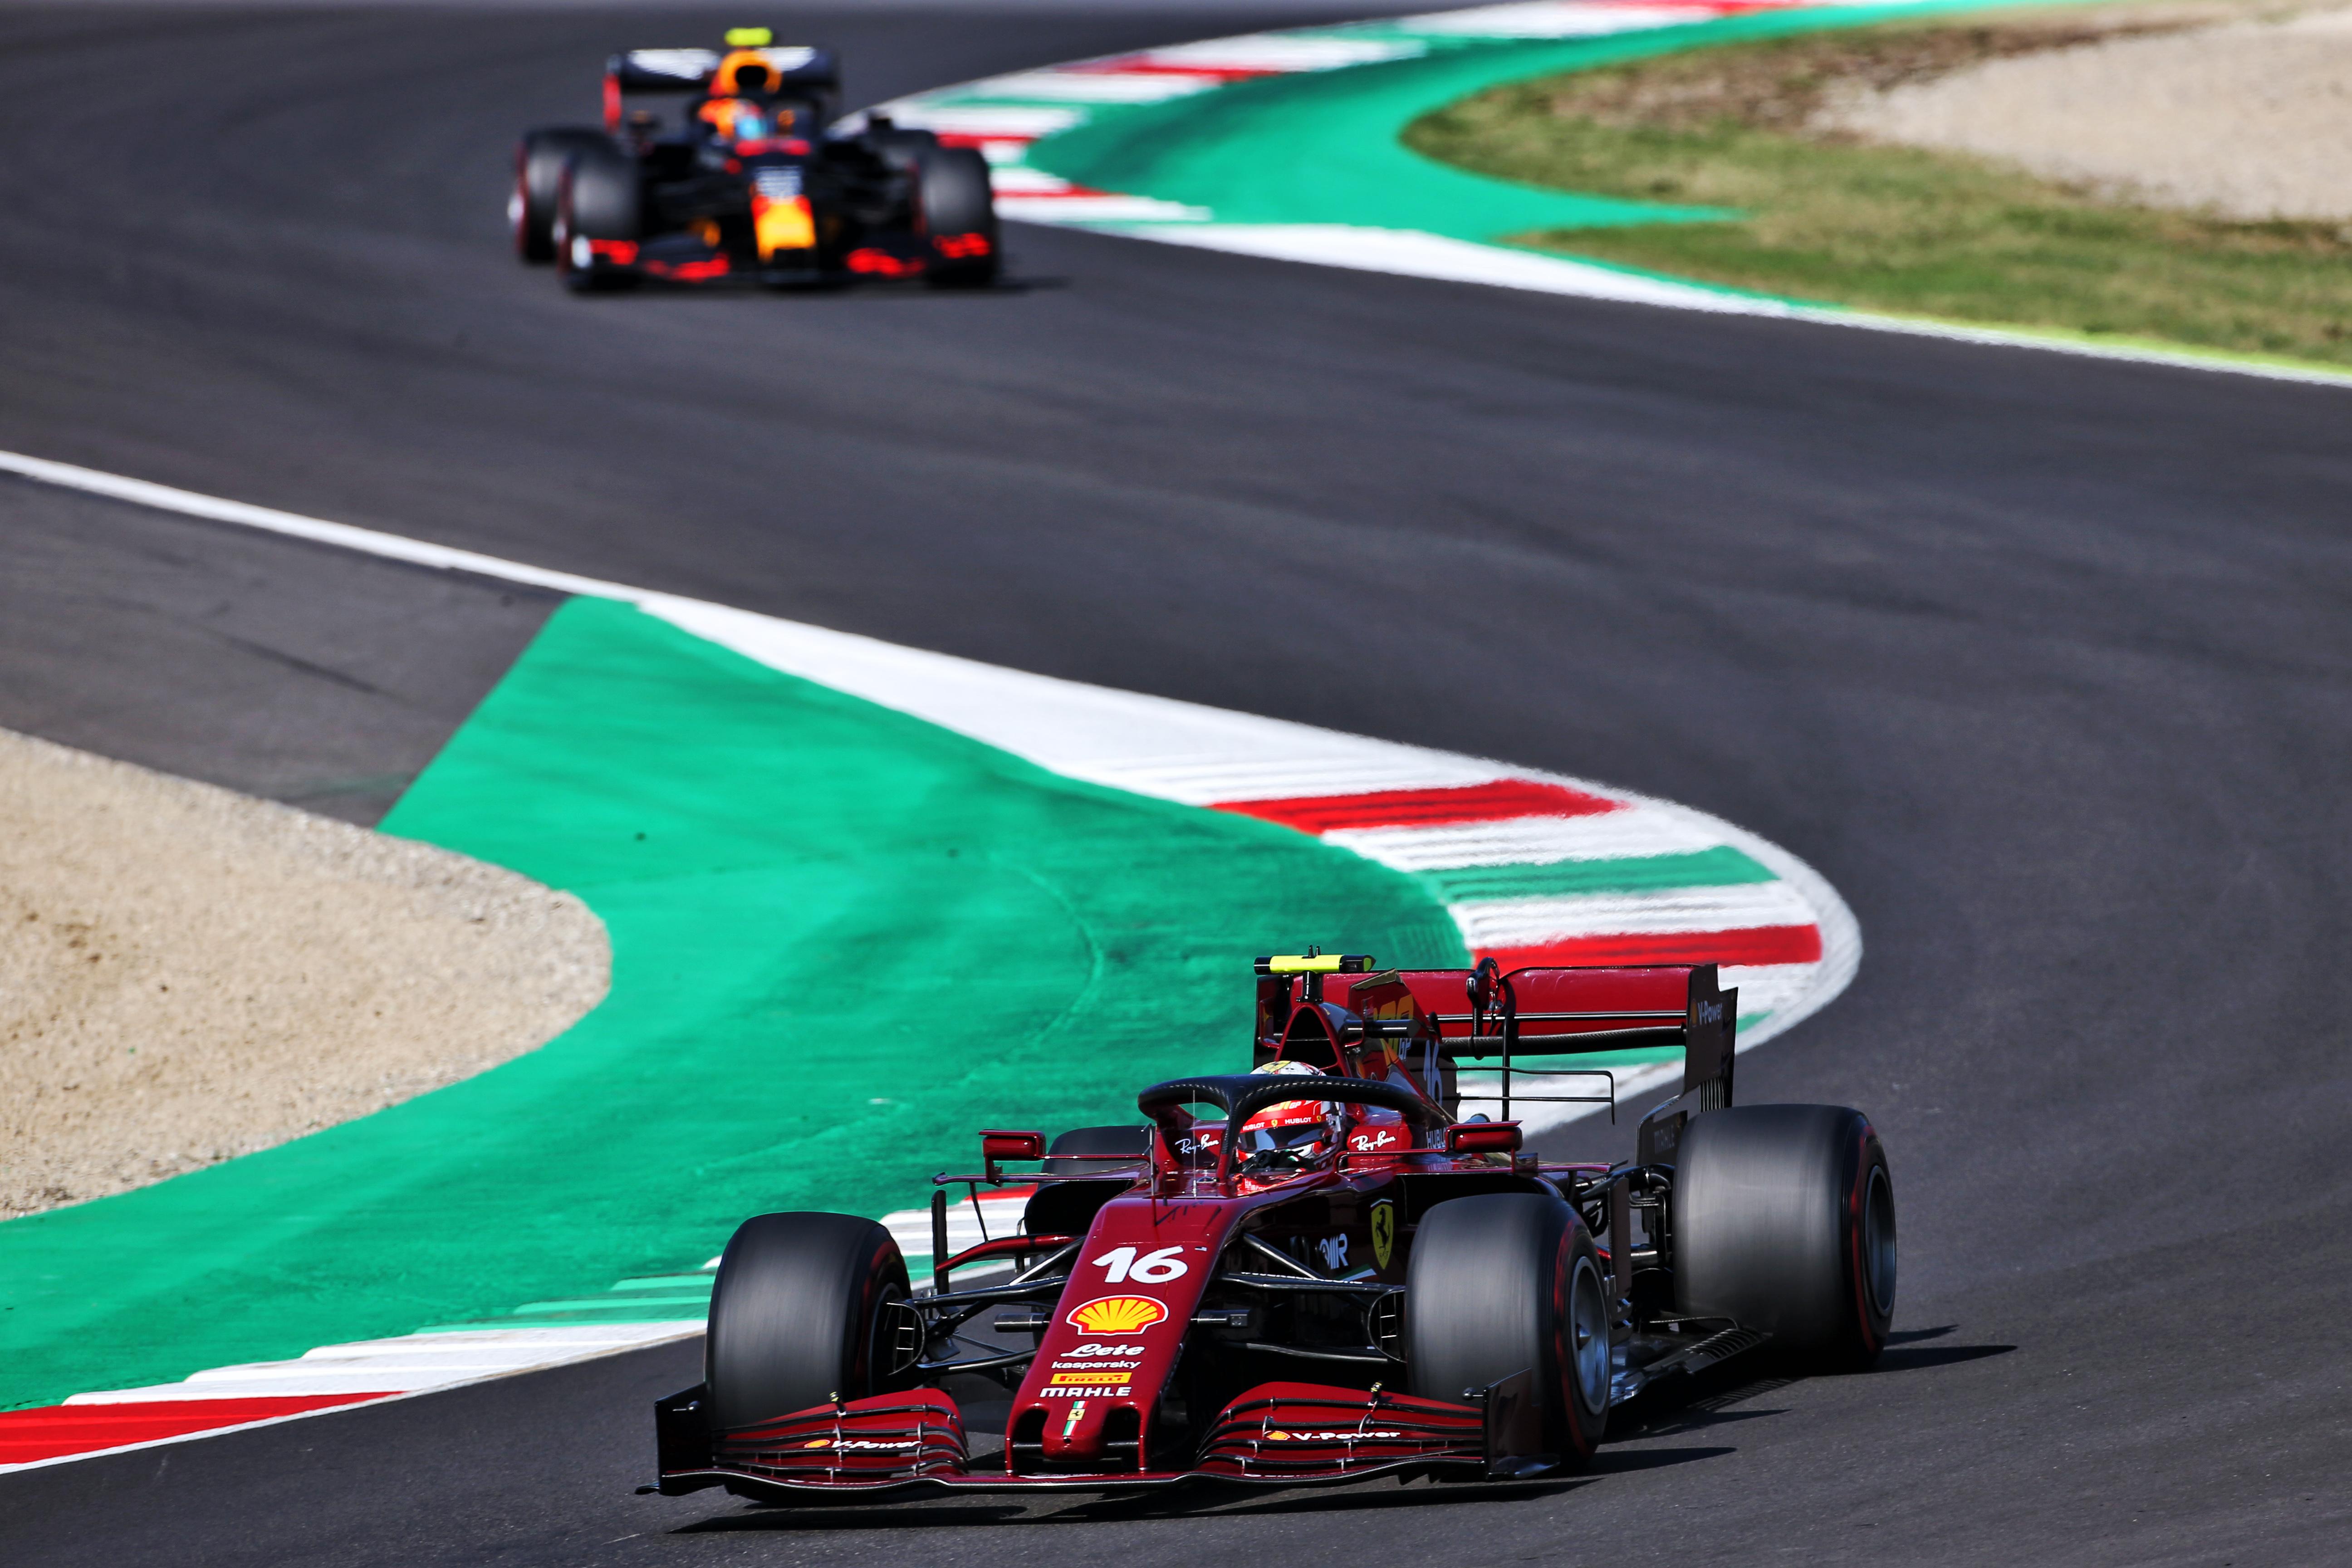 Charles Leclerc Ferrari Tuscan Grand Prix 2020 Mugello